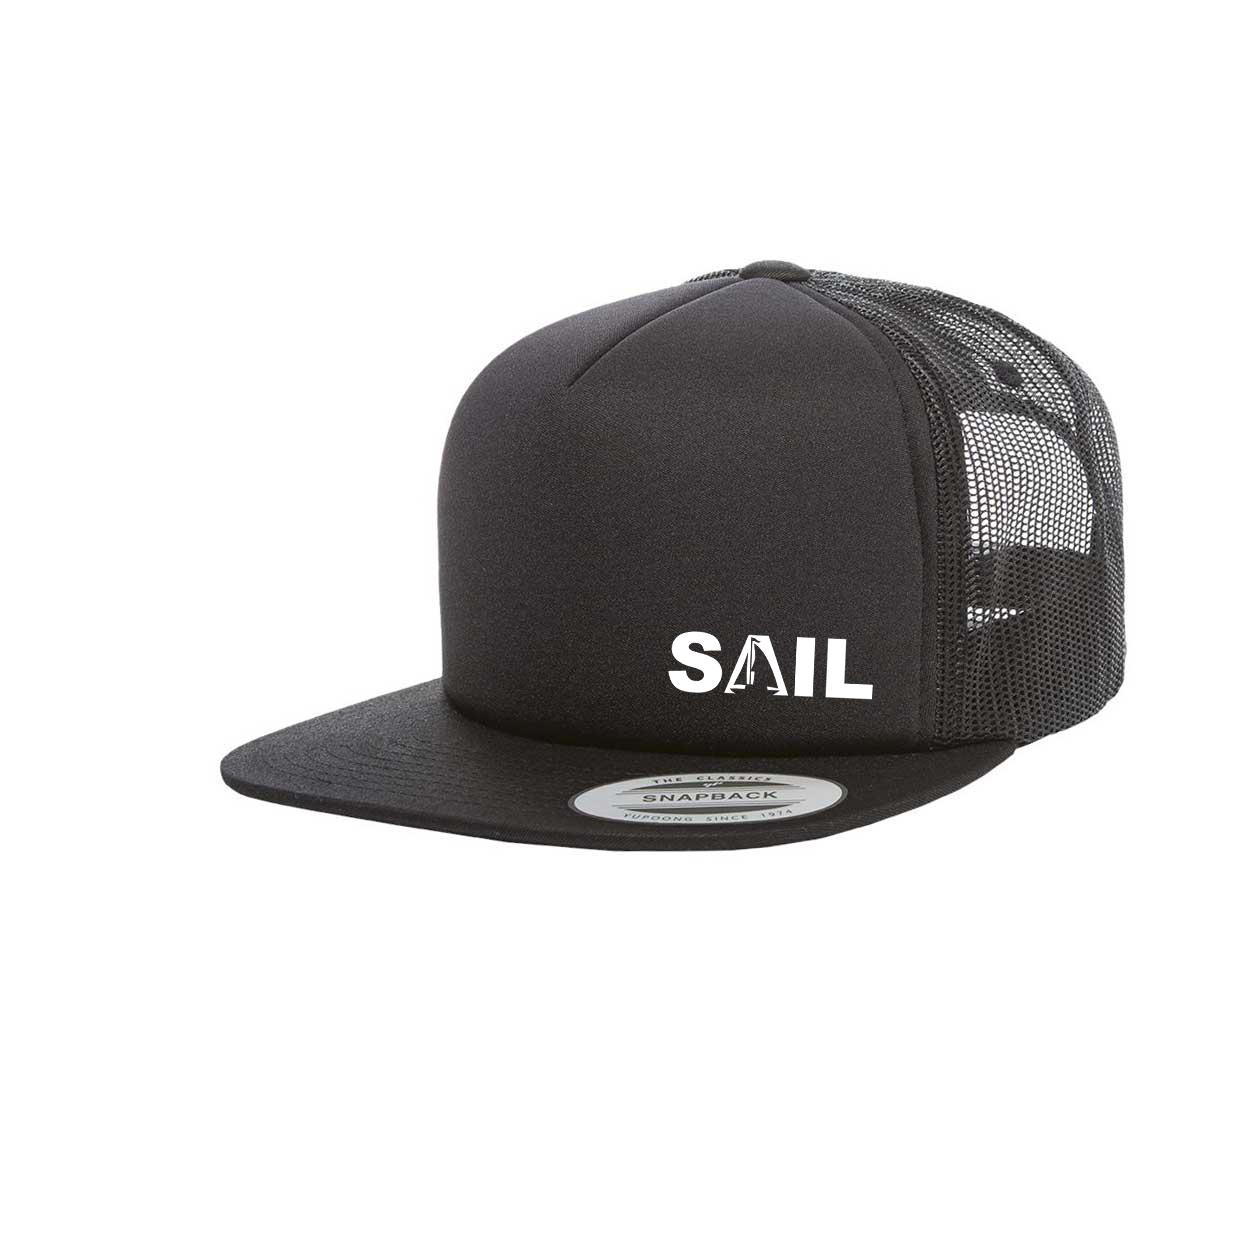 Sail Boat Logo Night Out Premium Foam Flat Brim Snapback Hat Black (White Logo)